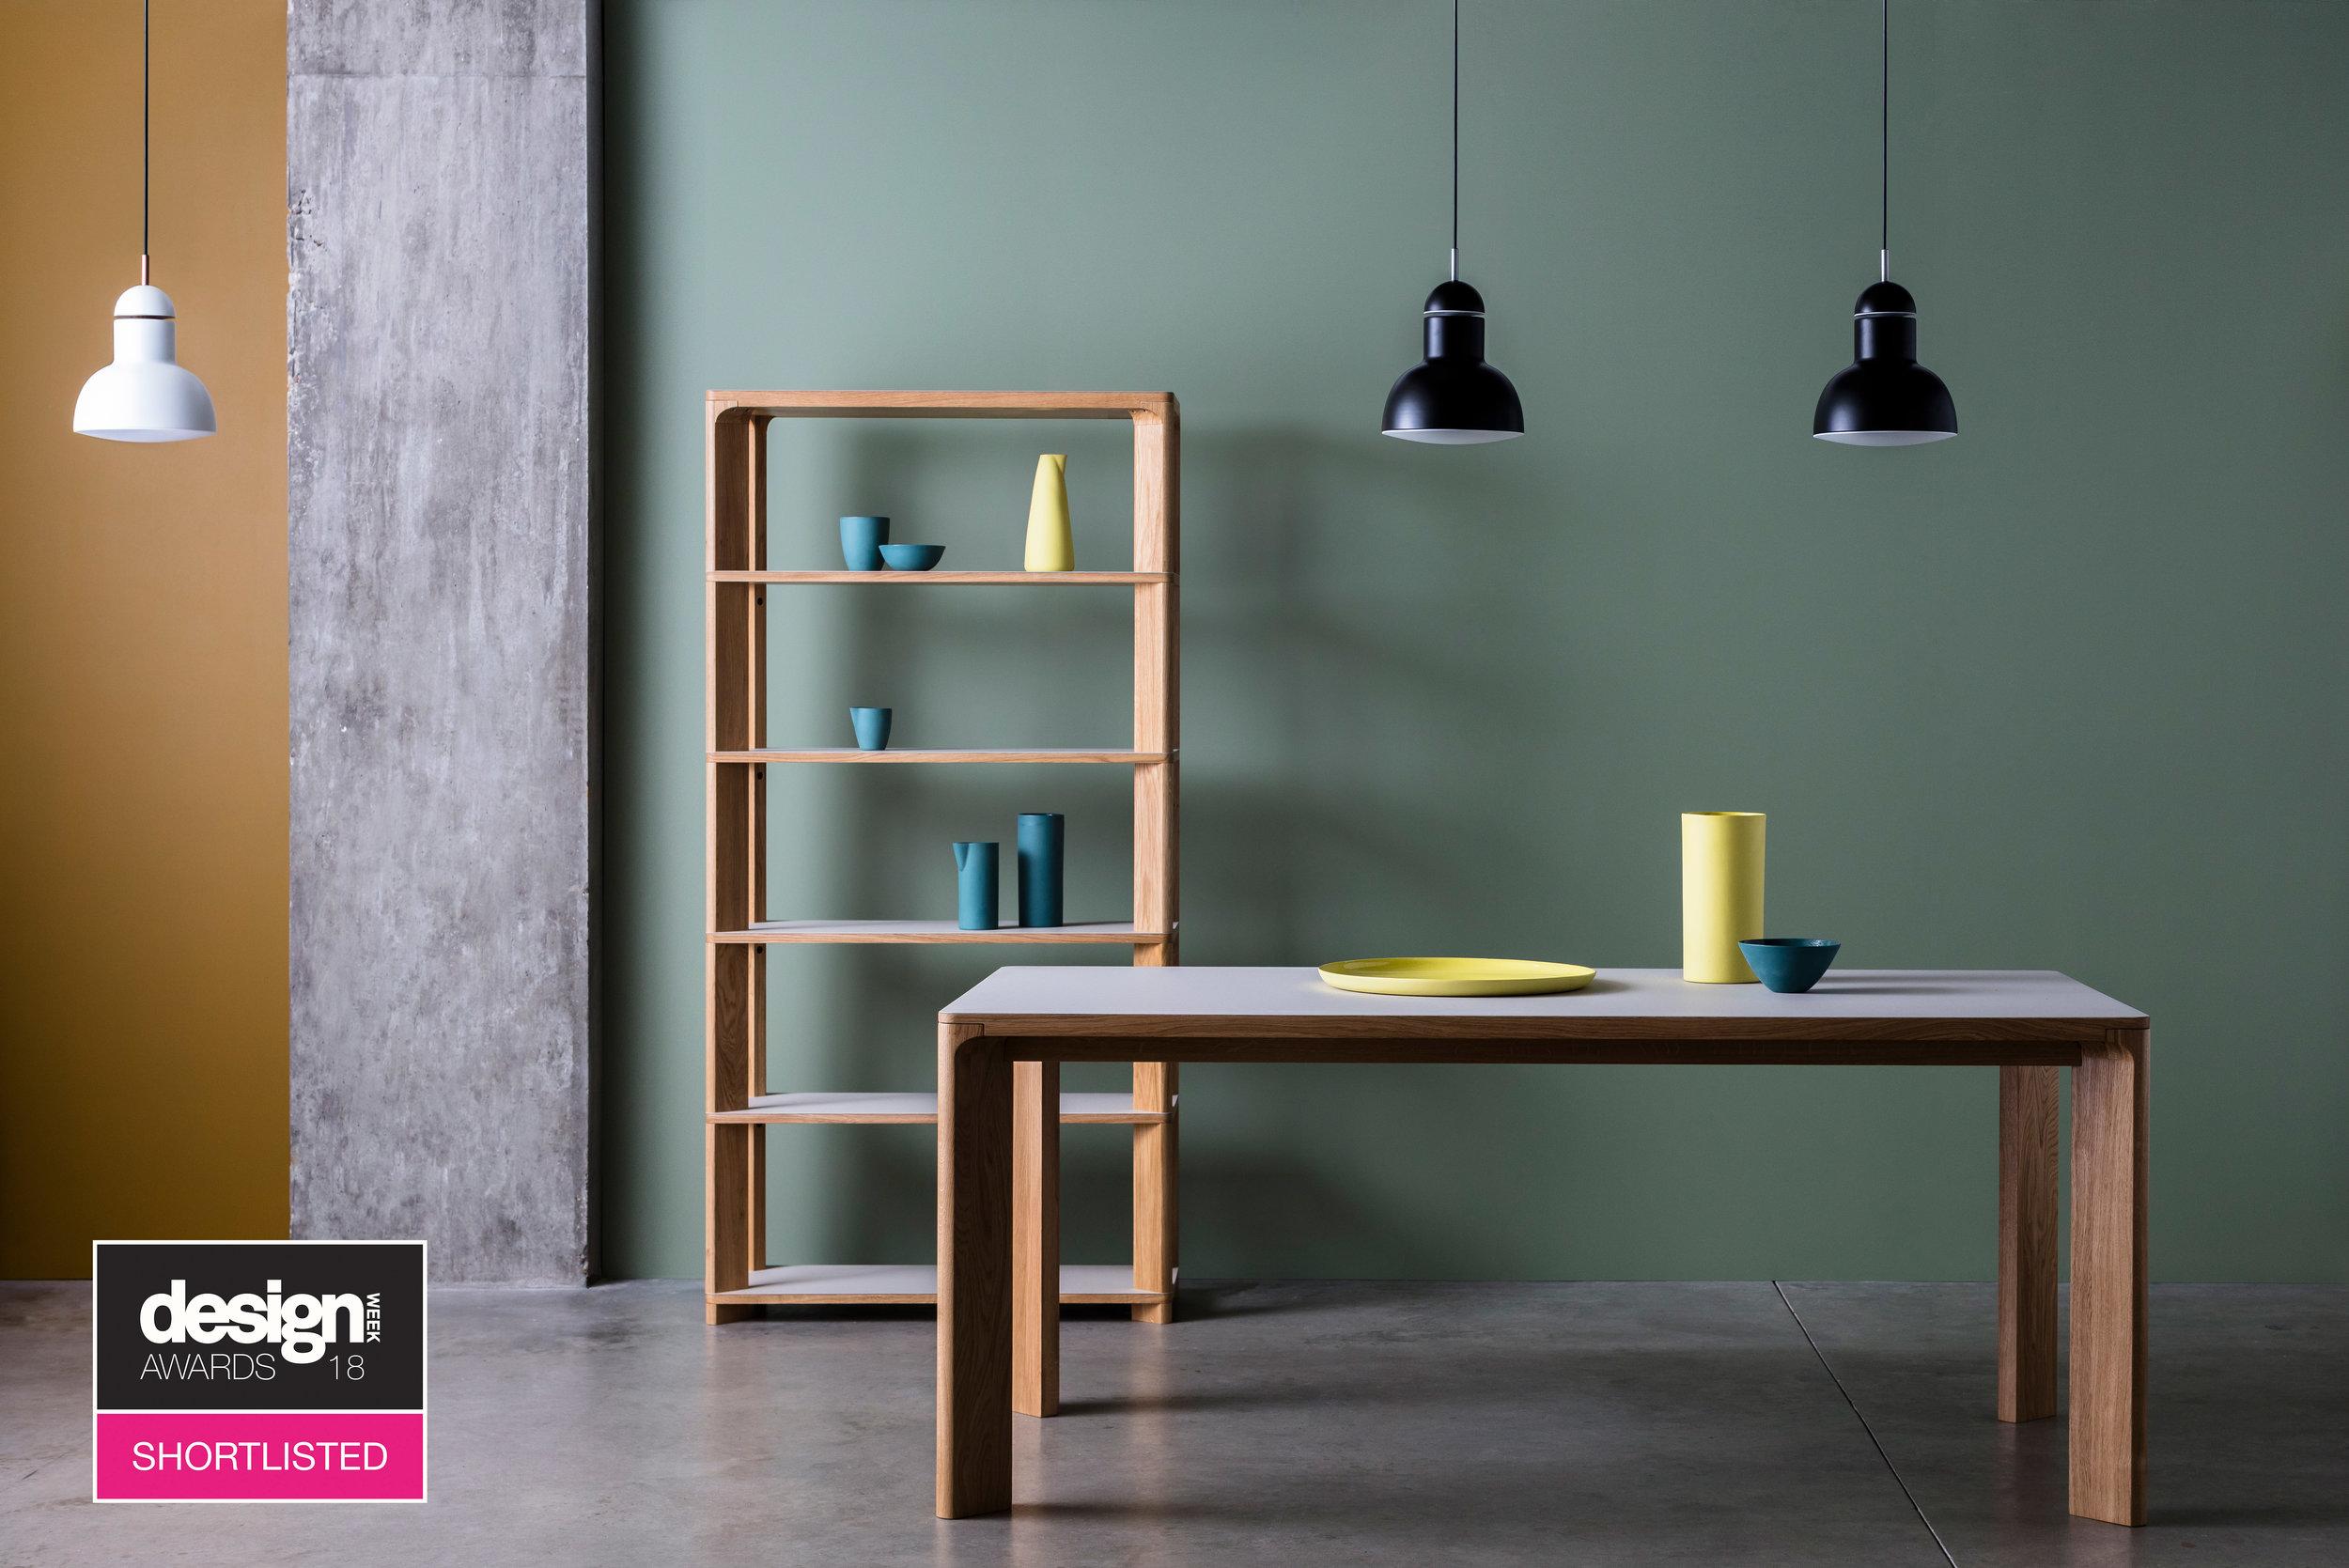 Another-Brand-Emile-Jones-Lastra-Furniture-Design-Award.jpg